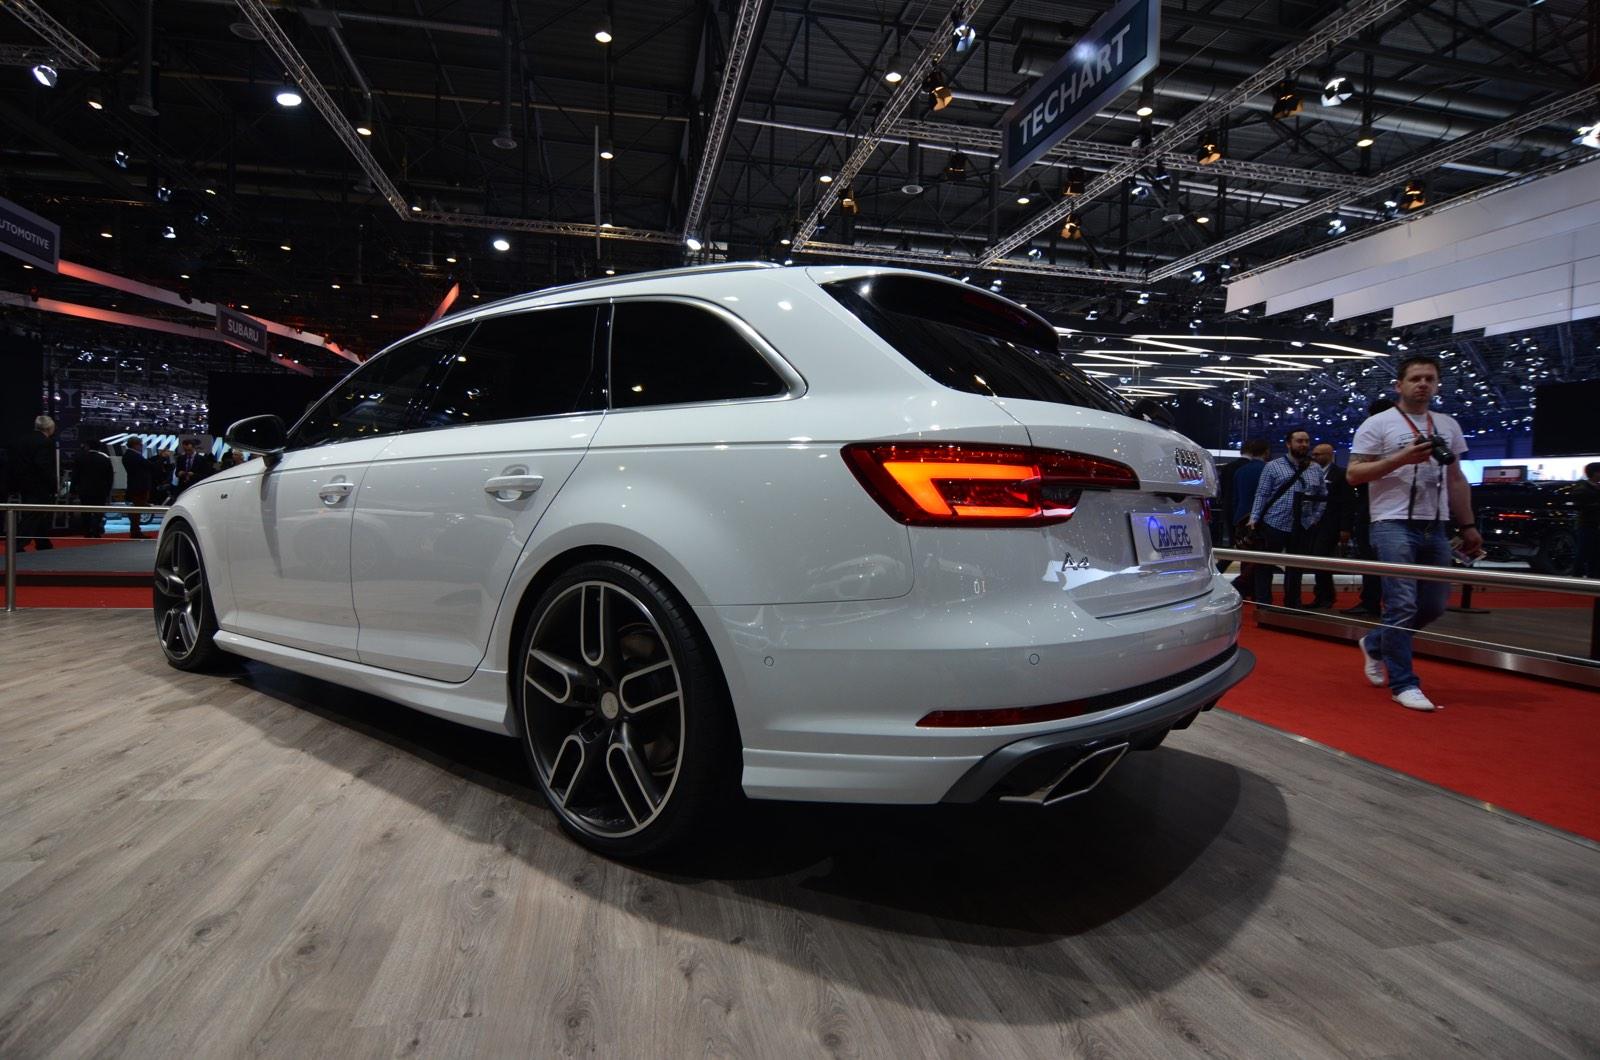 Audi A4 2.0 T >> Geneva 2016: Caractere Exclusive Audi A4 Avant - GTspirit